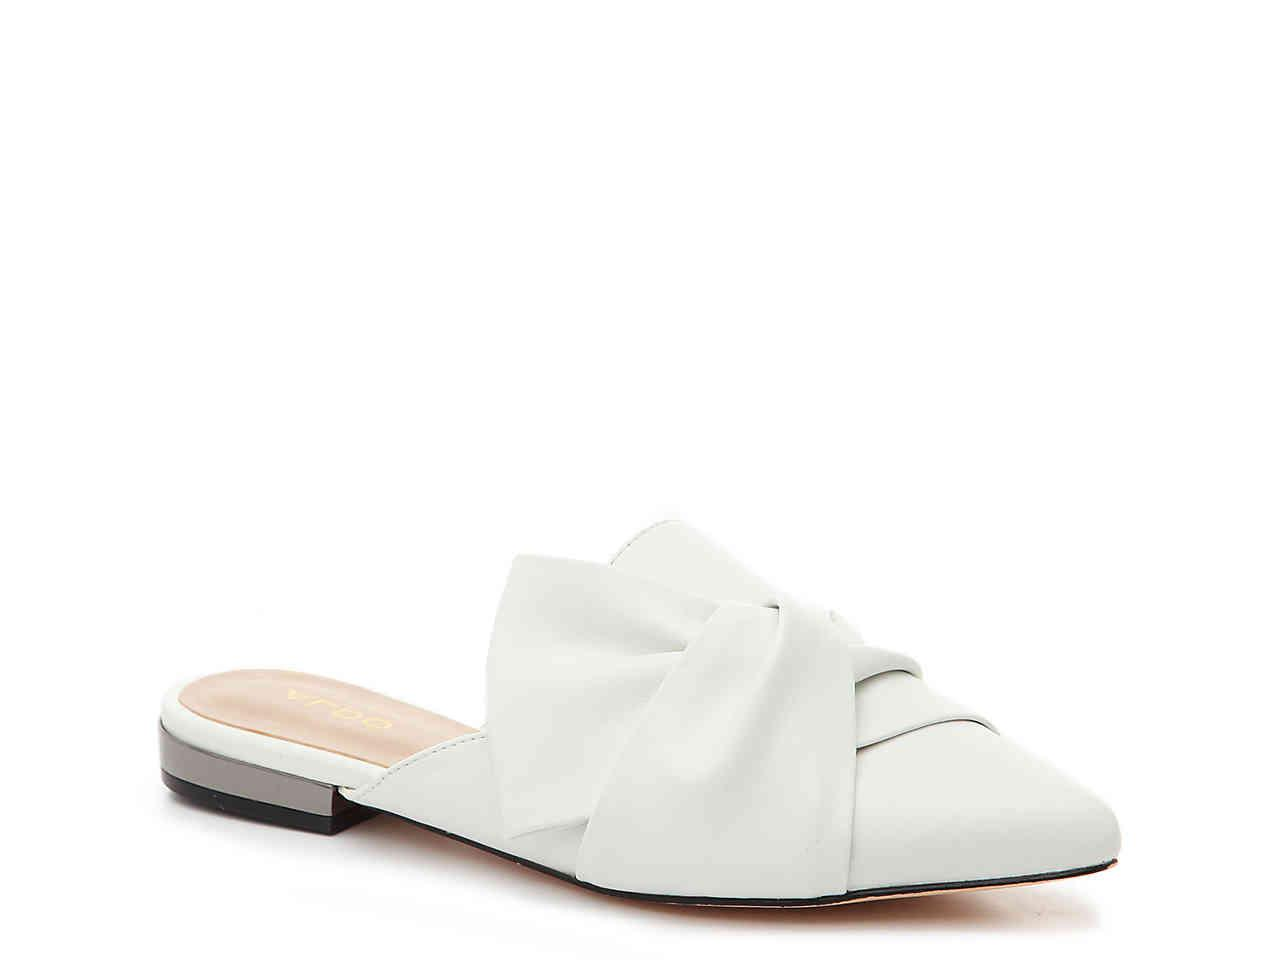 ALDO CADYDIA - Mules - white 5xhFGB